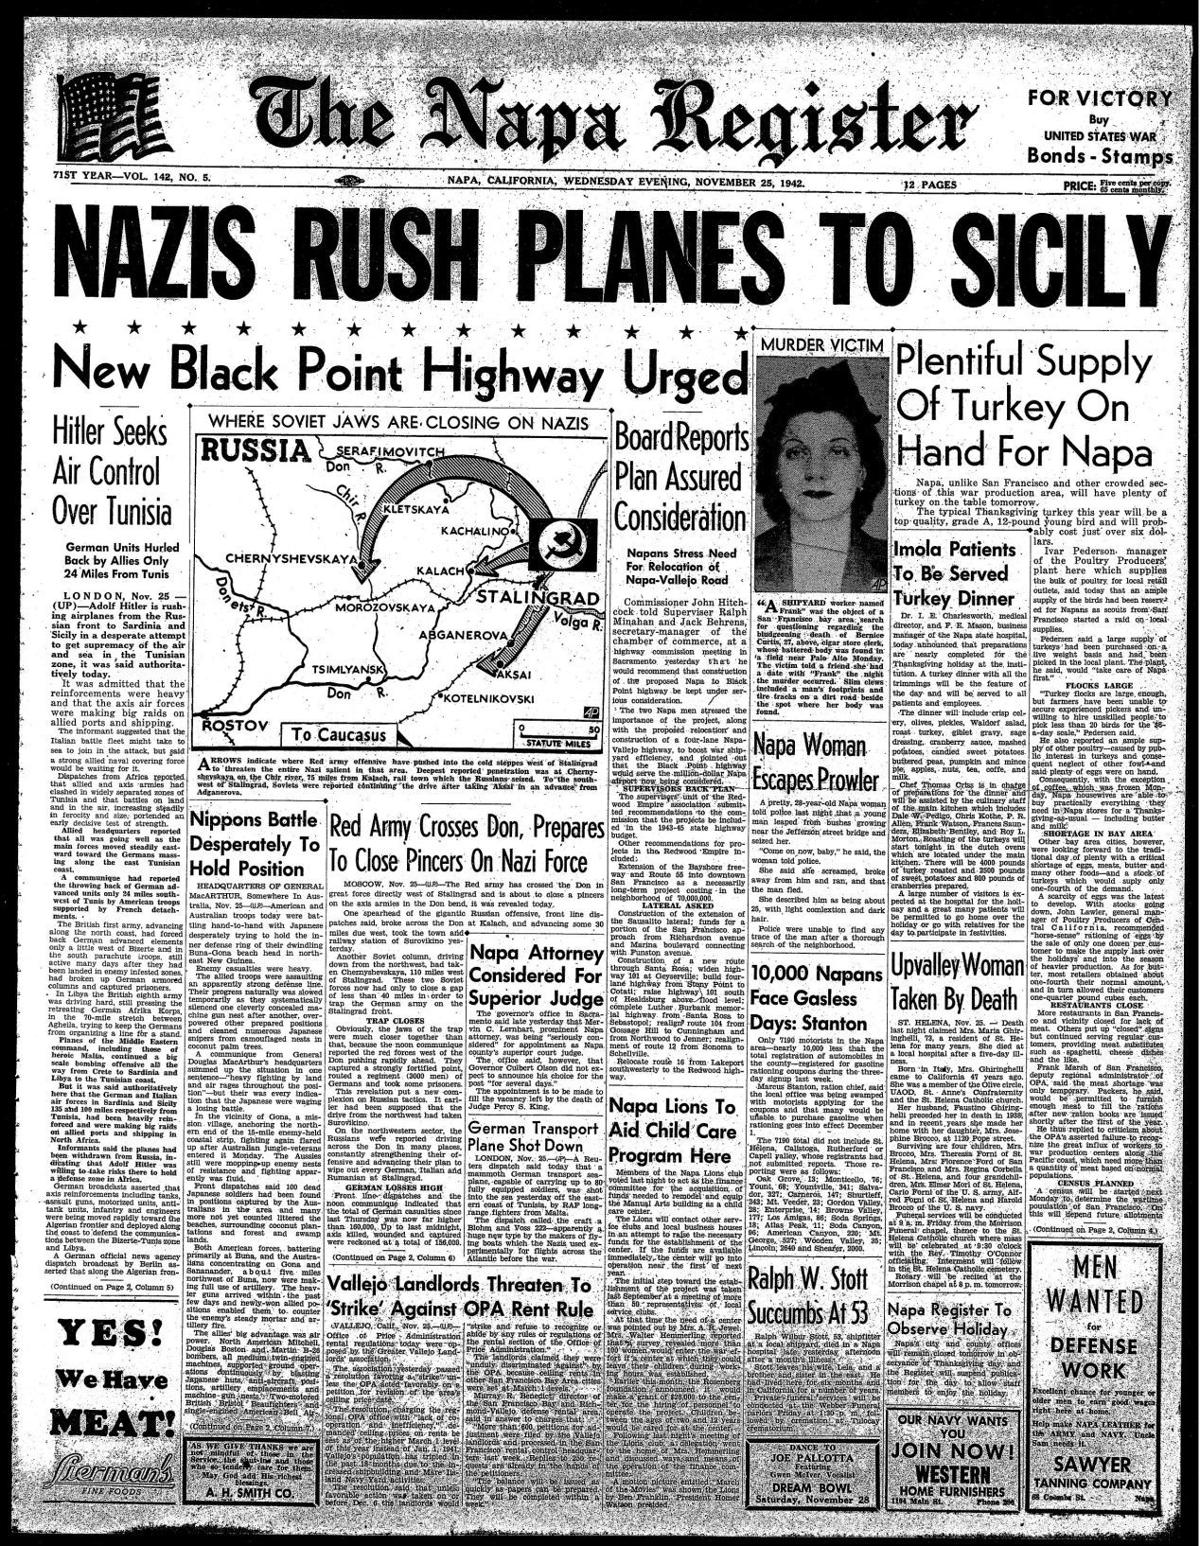 Nov. 26, 1942